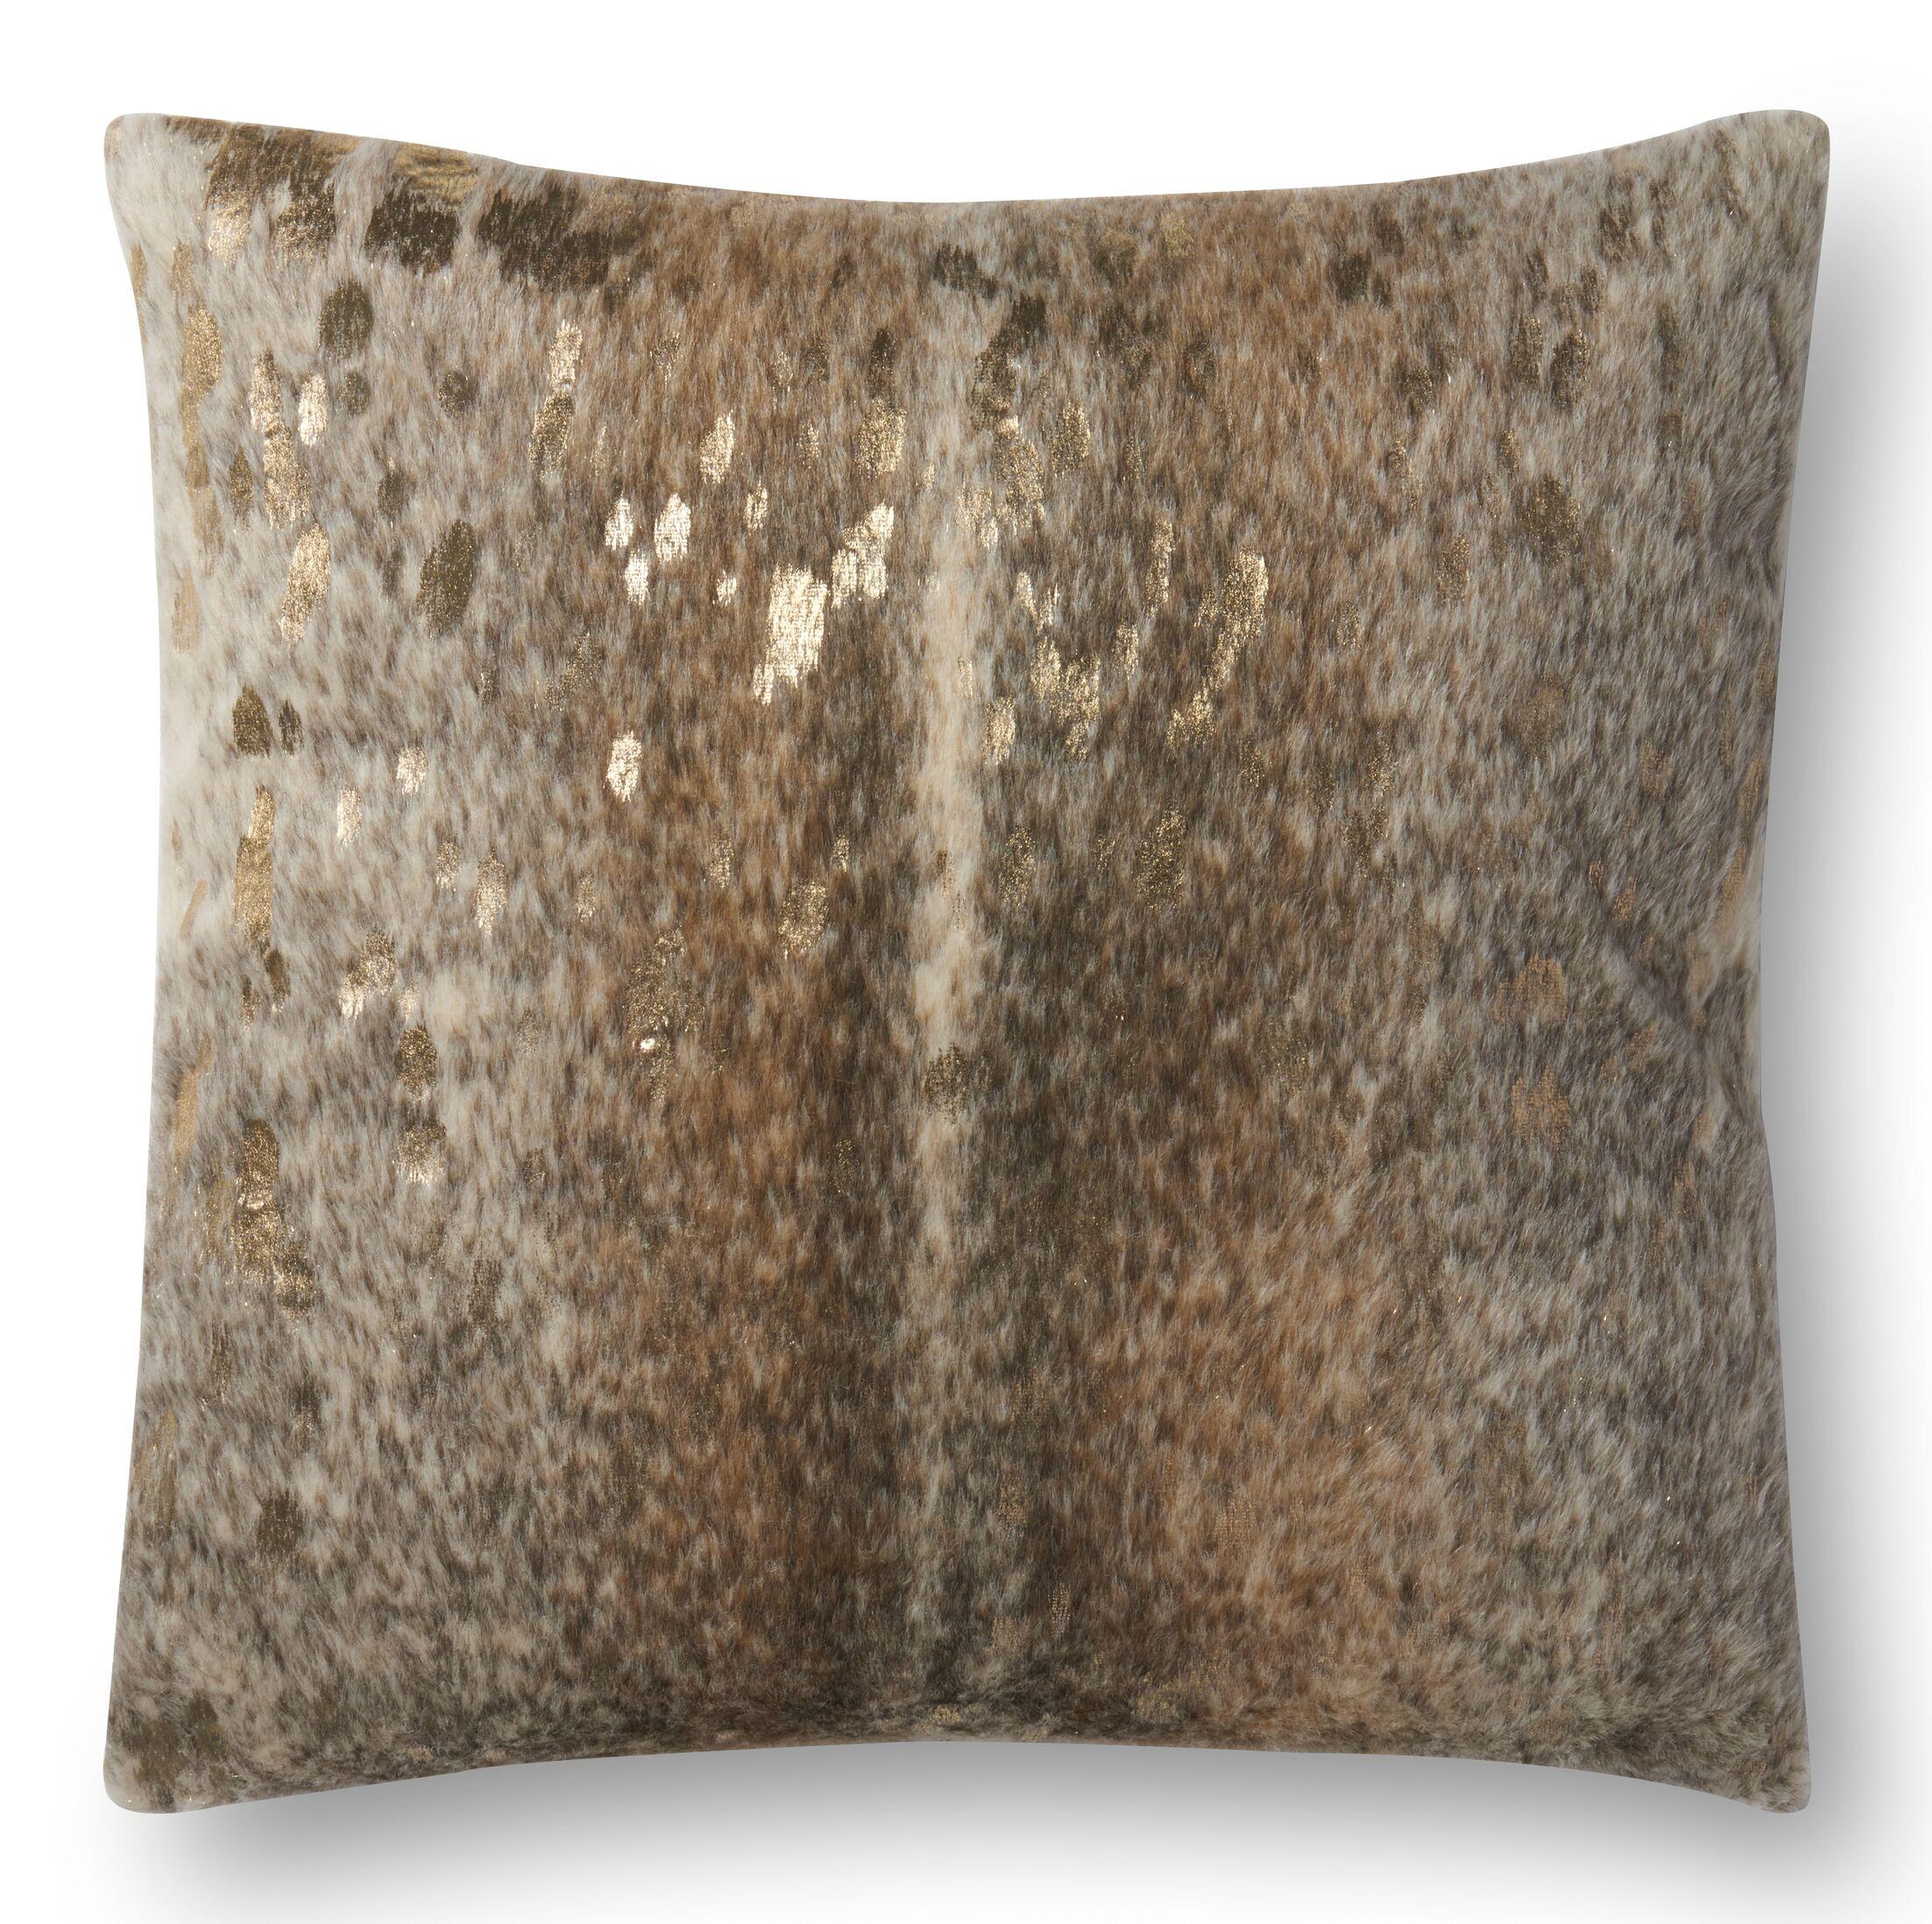 Knapp Throw Pillow Color: Khaki